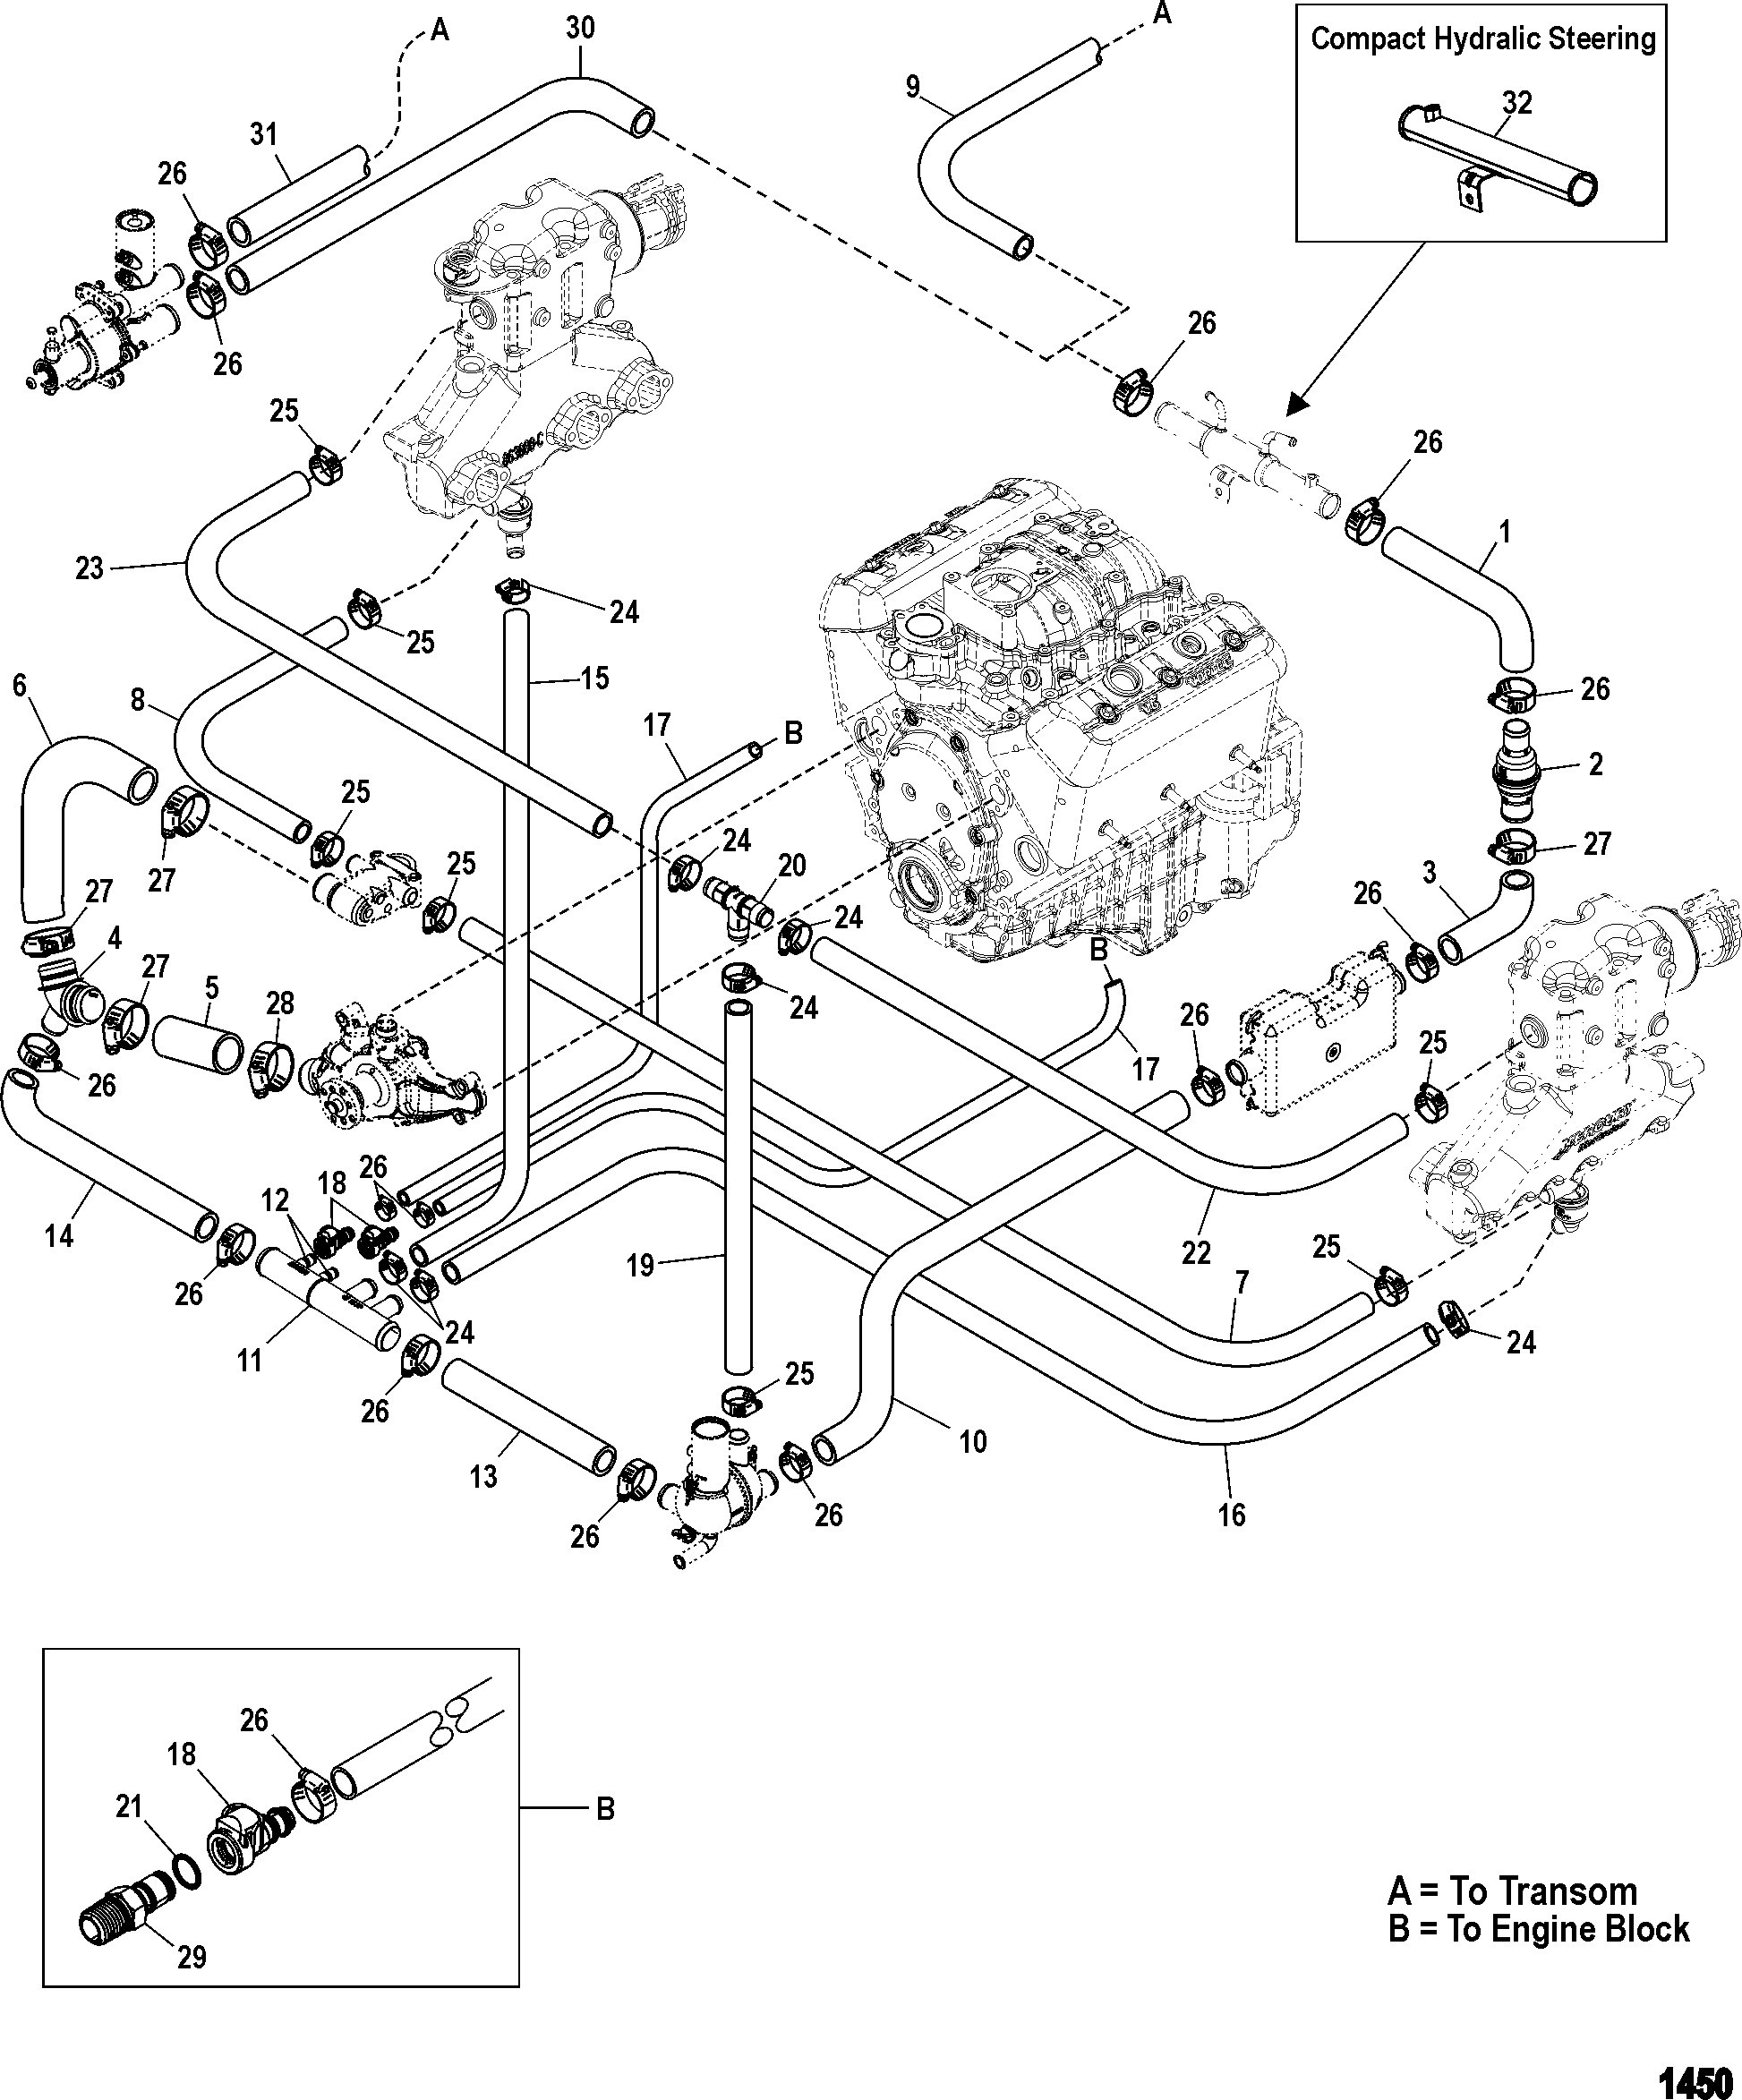 HV_0069] Silverado 4 3 Engine Diagram Download DiagramJebrp Faun Attr Benkeme Mohammedshrine Librar Wiring 101